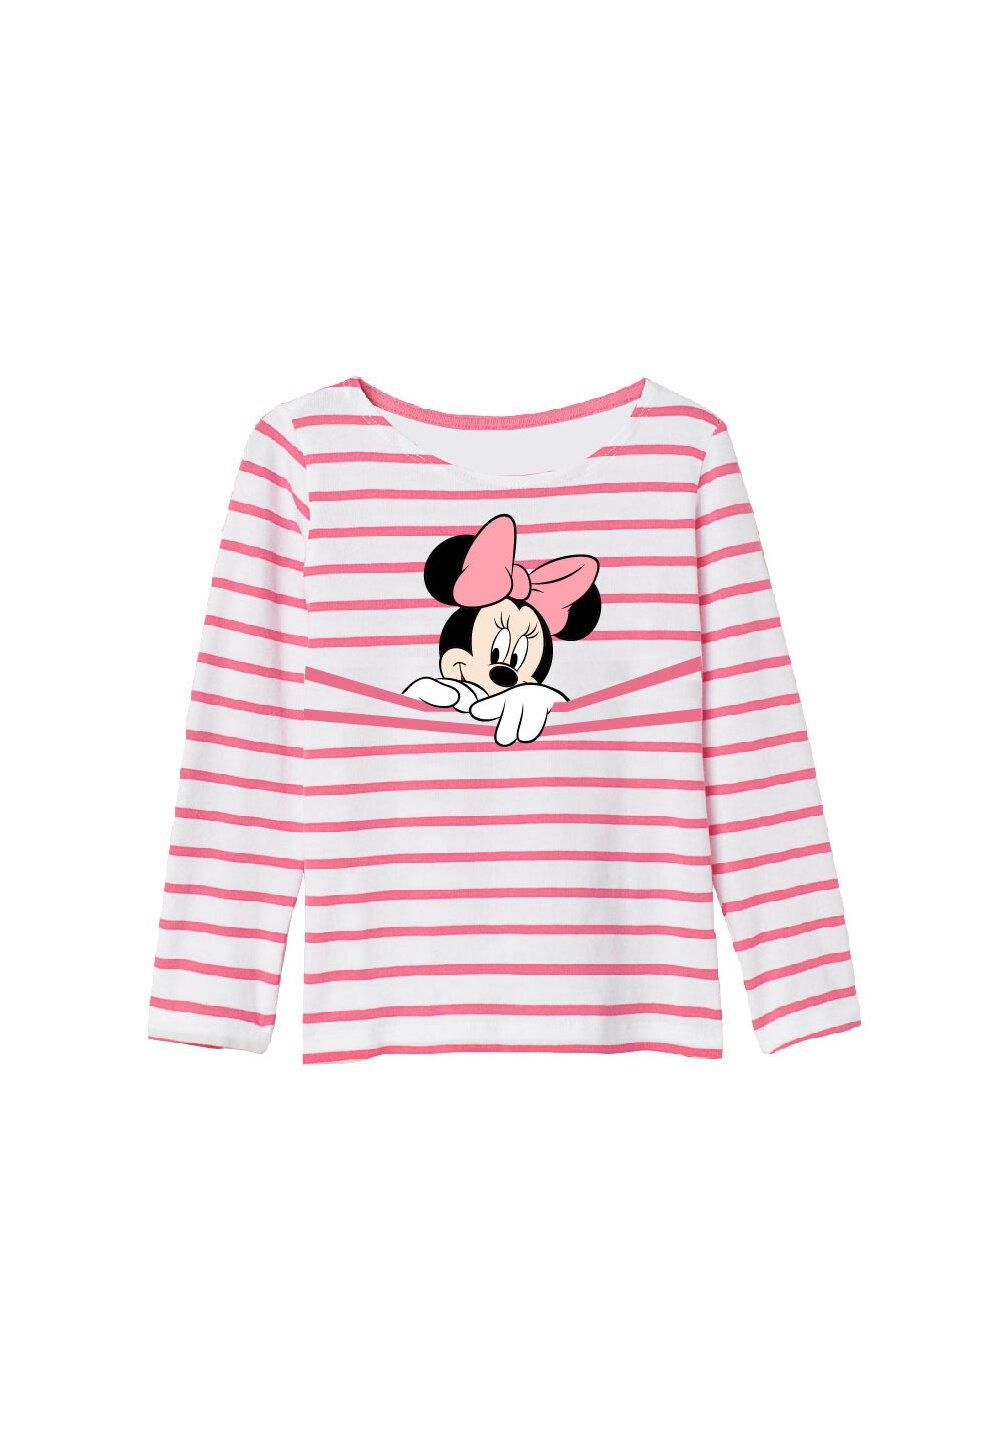 Bluza Minnie Mouse,alba cu dungi roz imagine